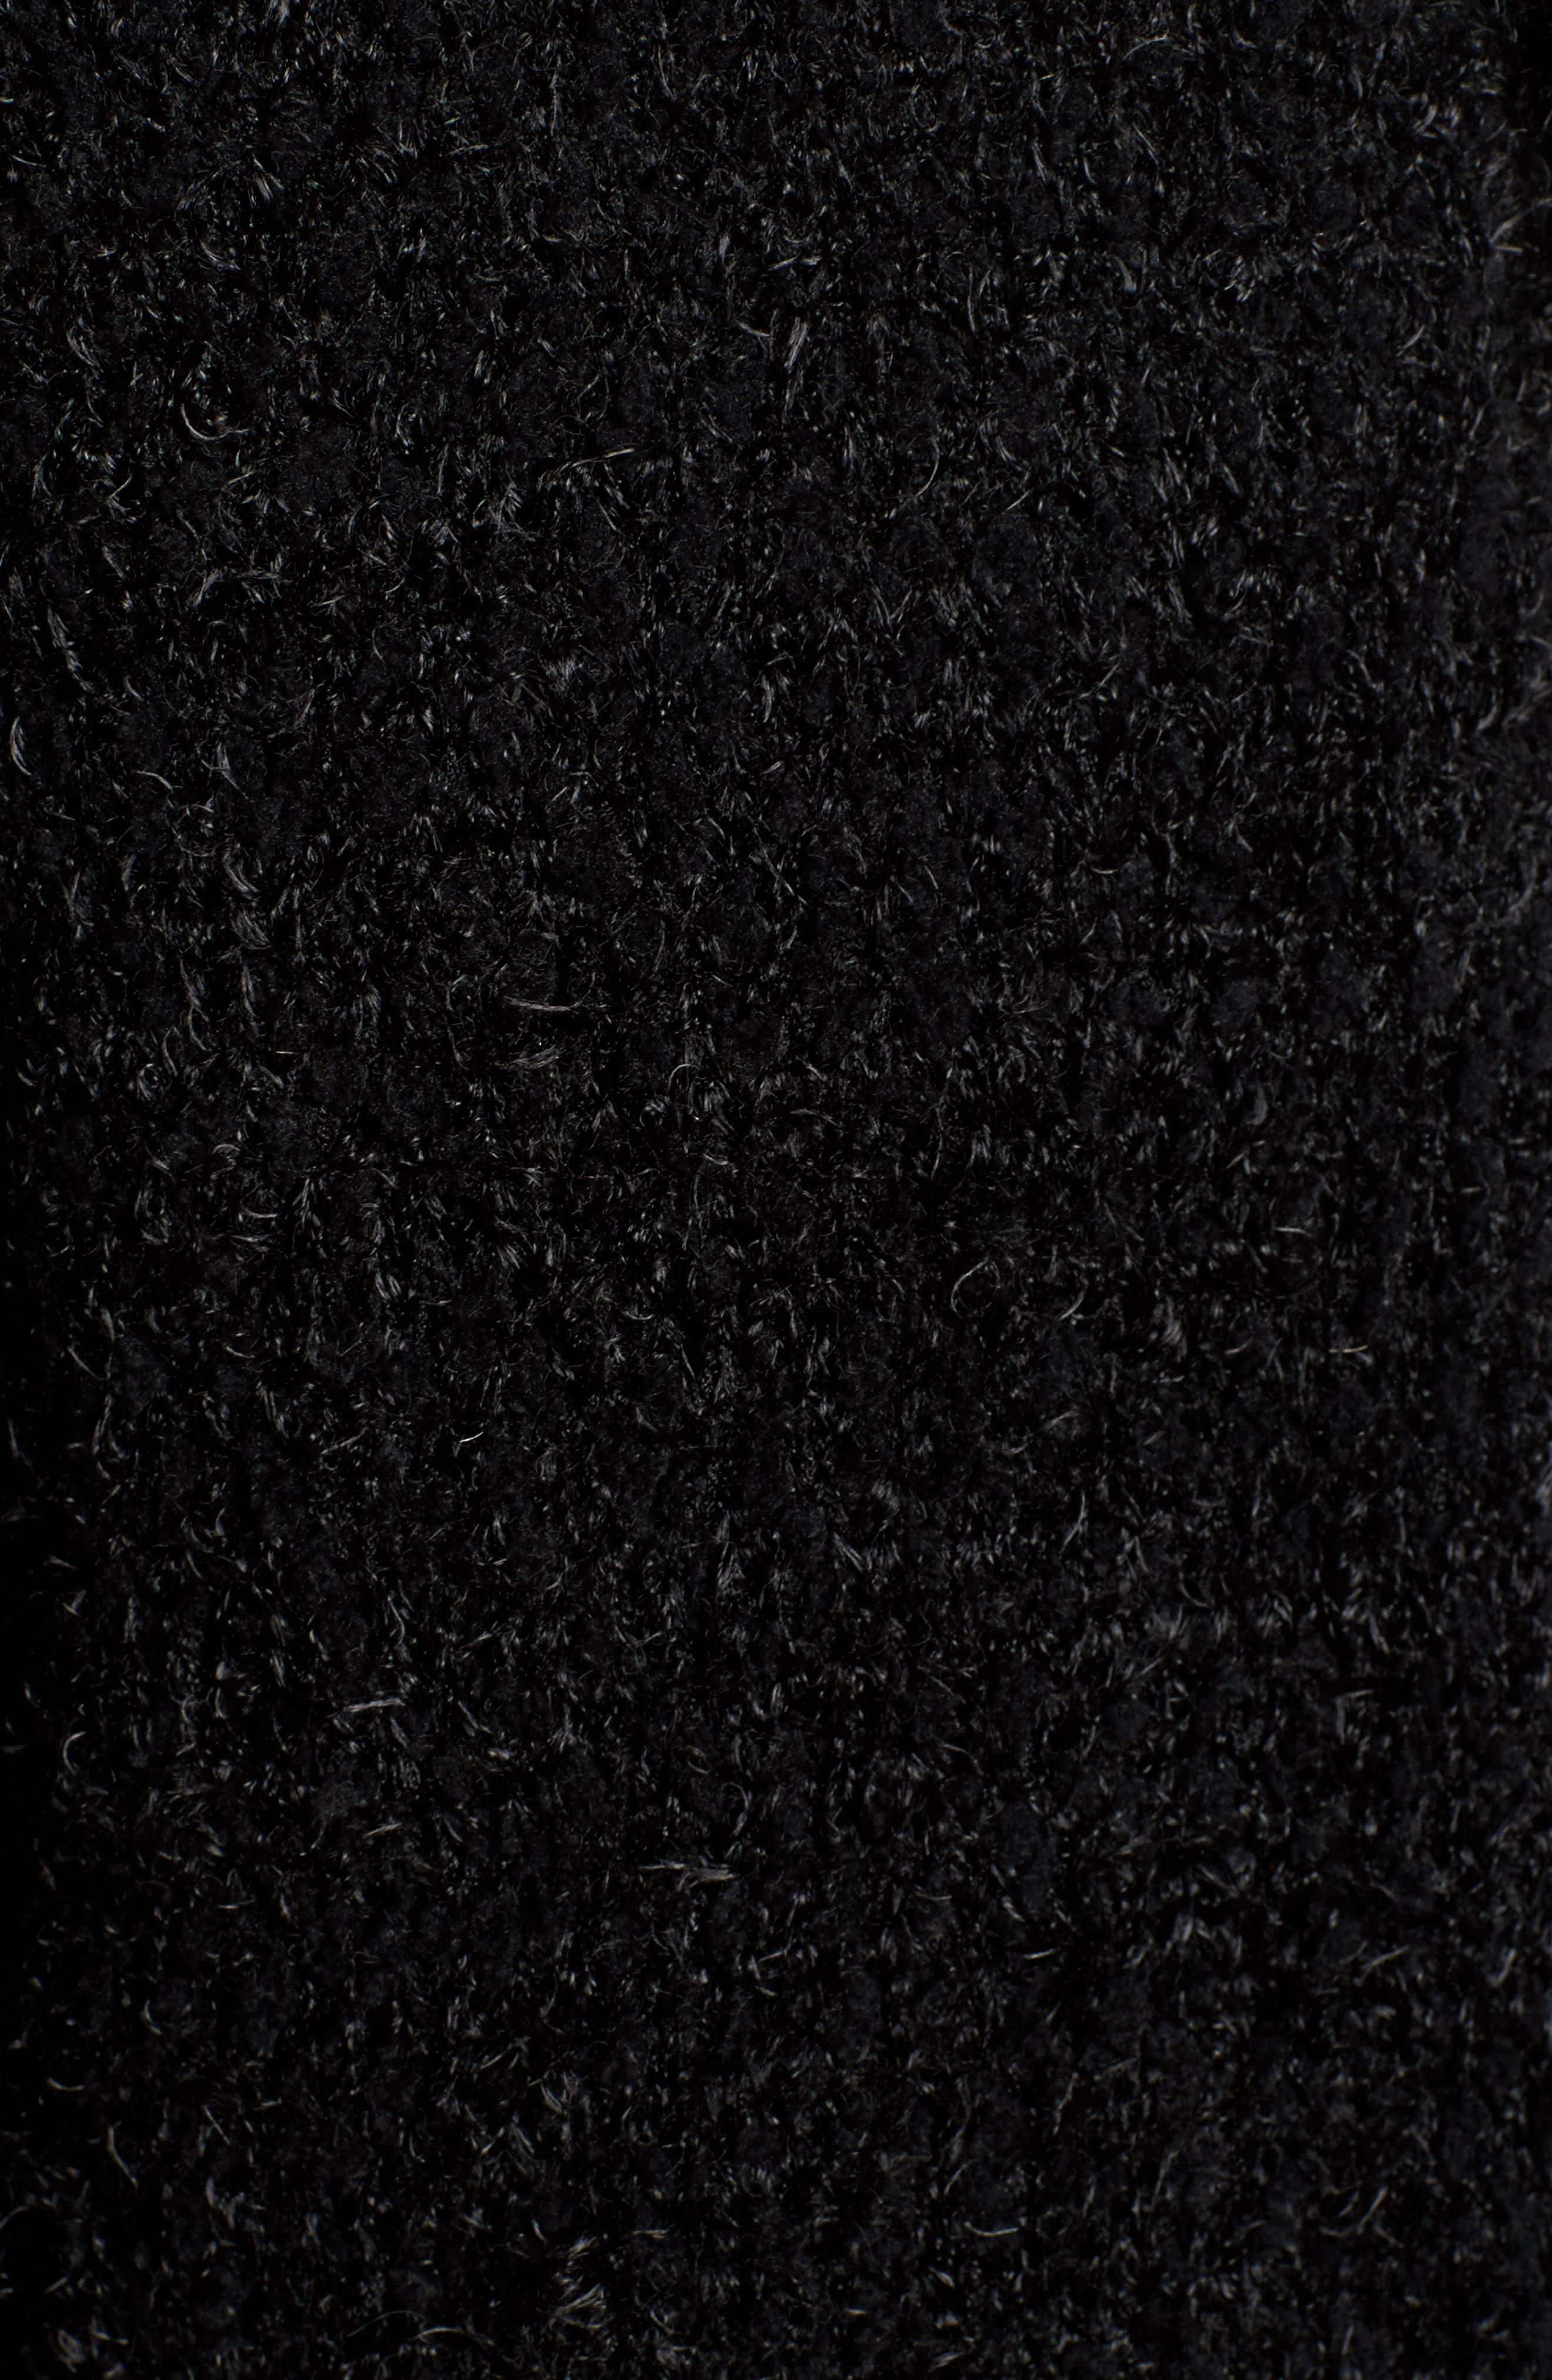 Eyelash Hooded Cardigan,                             Alternate thumbnail 5, color,                             001